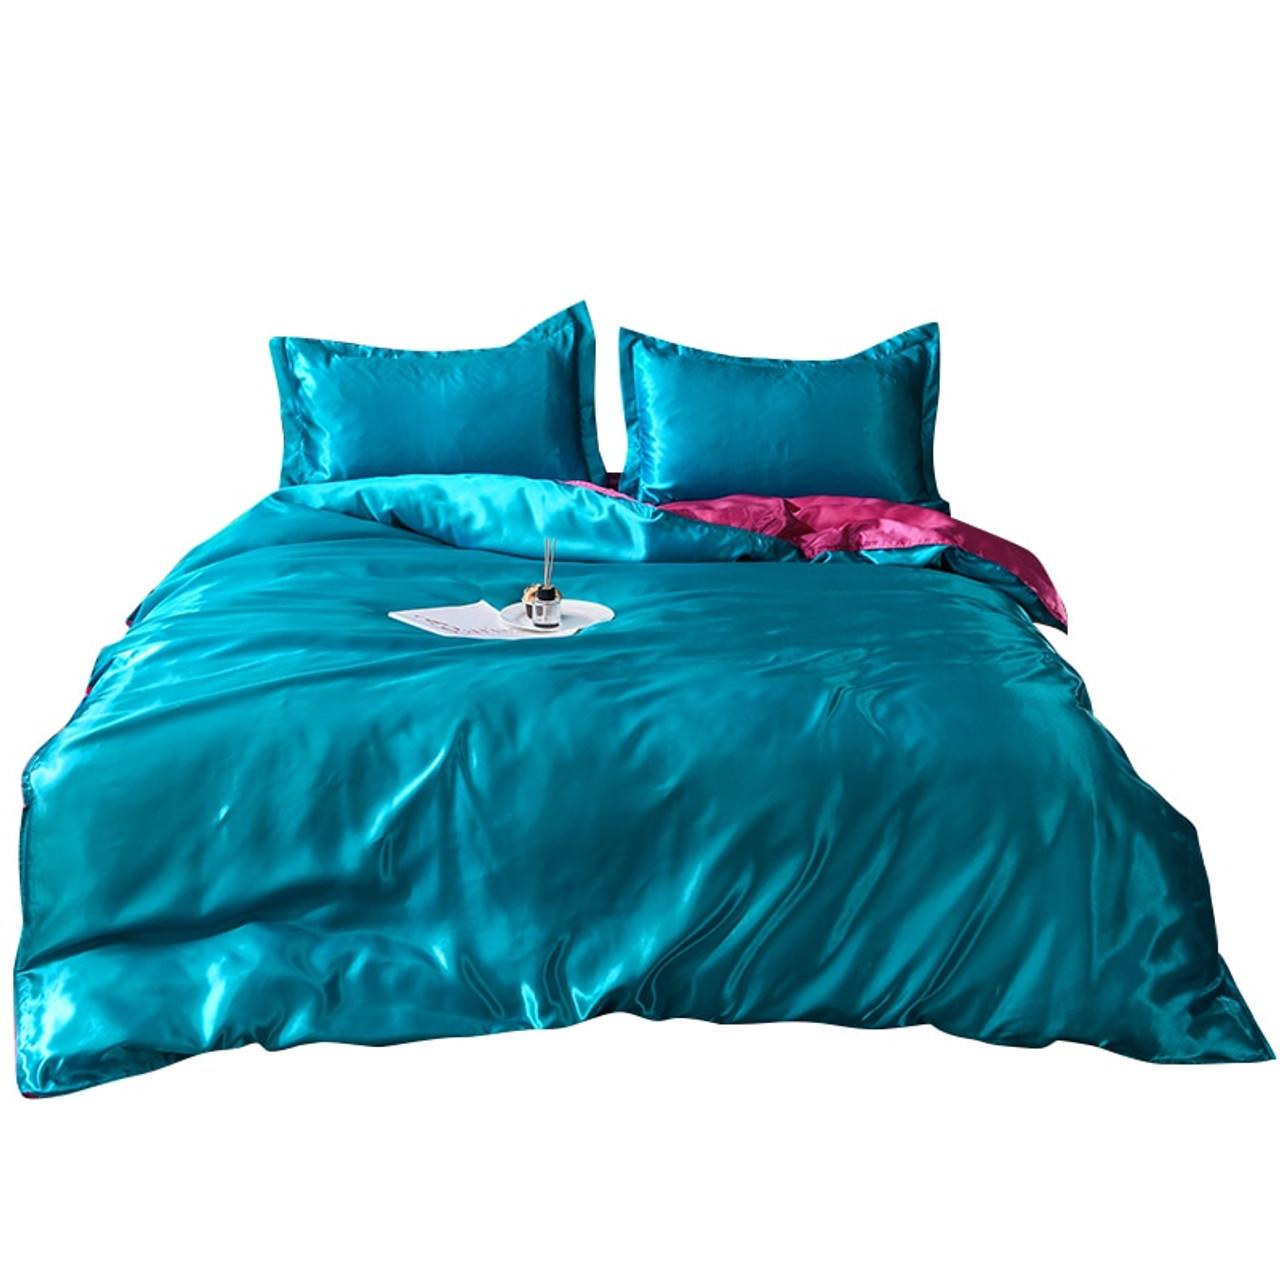 King Size 4 Pcs Satin Silk Bedding Set Duvet Cover Fitted Sheet /& 2 Pillow Cases